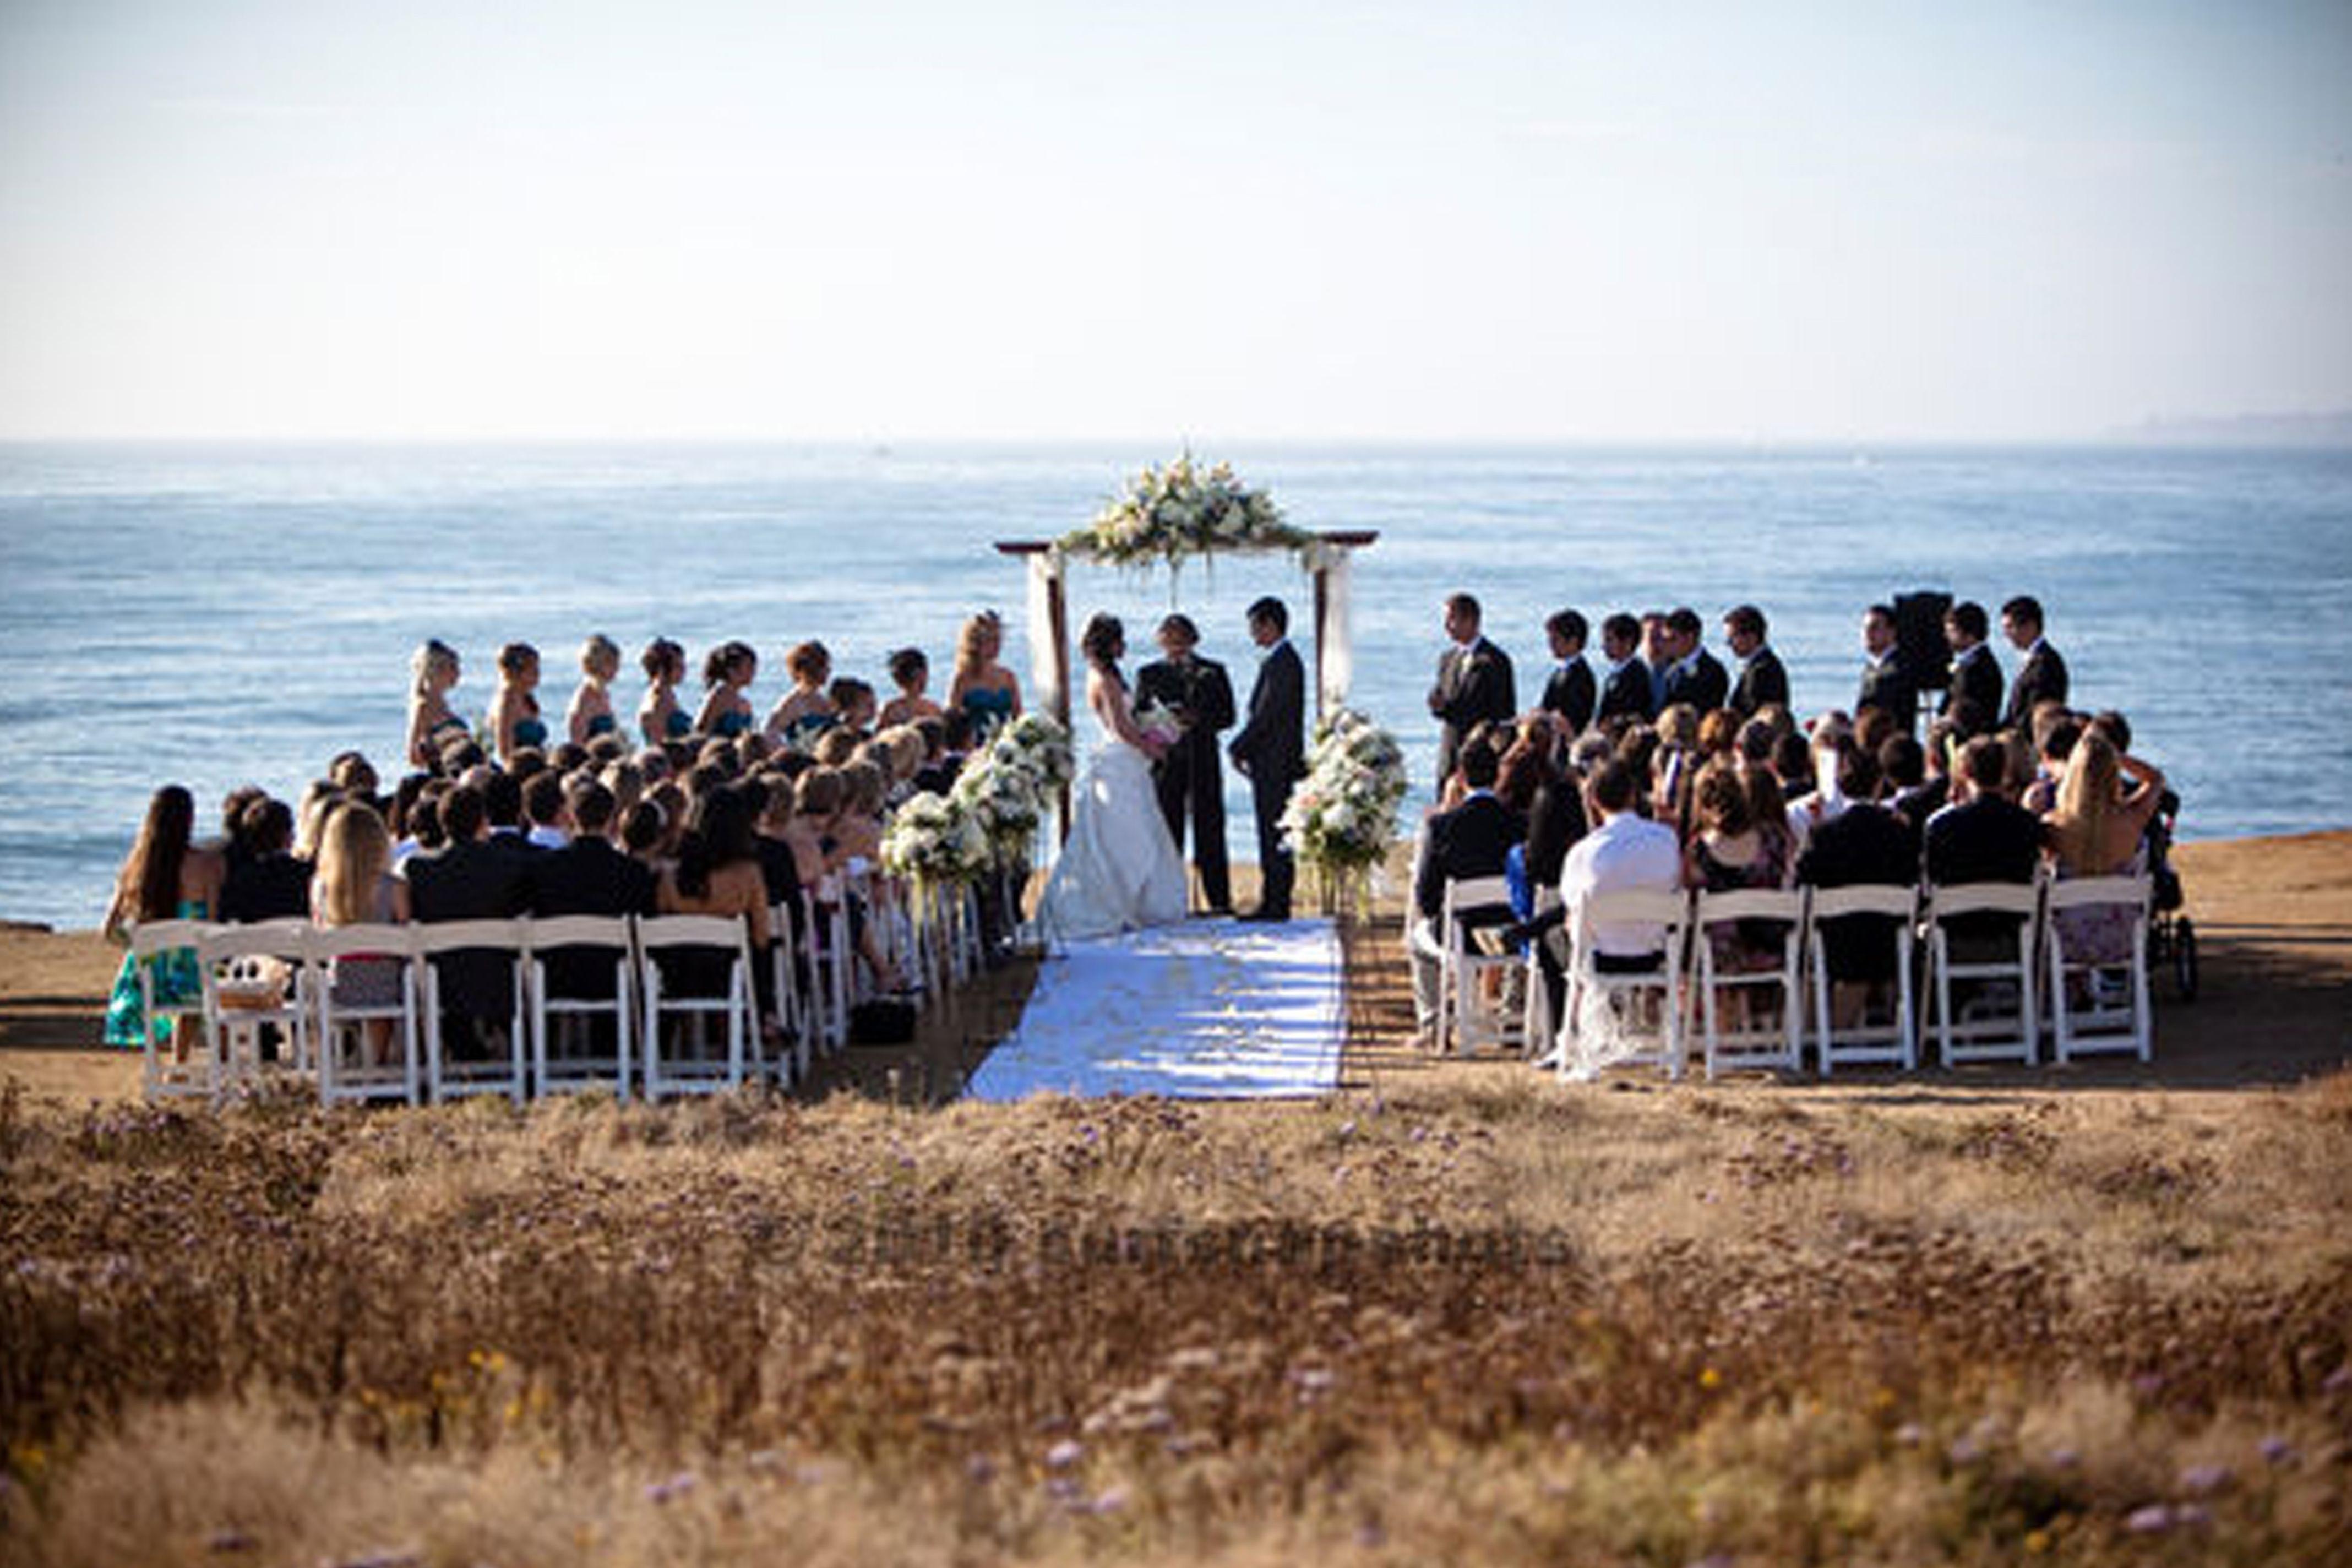 Cliff wedding venues philippines